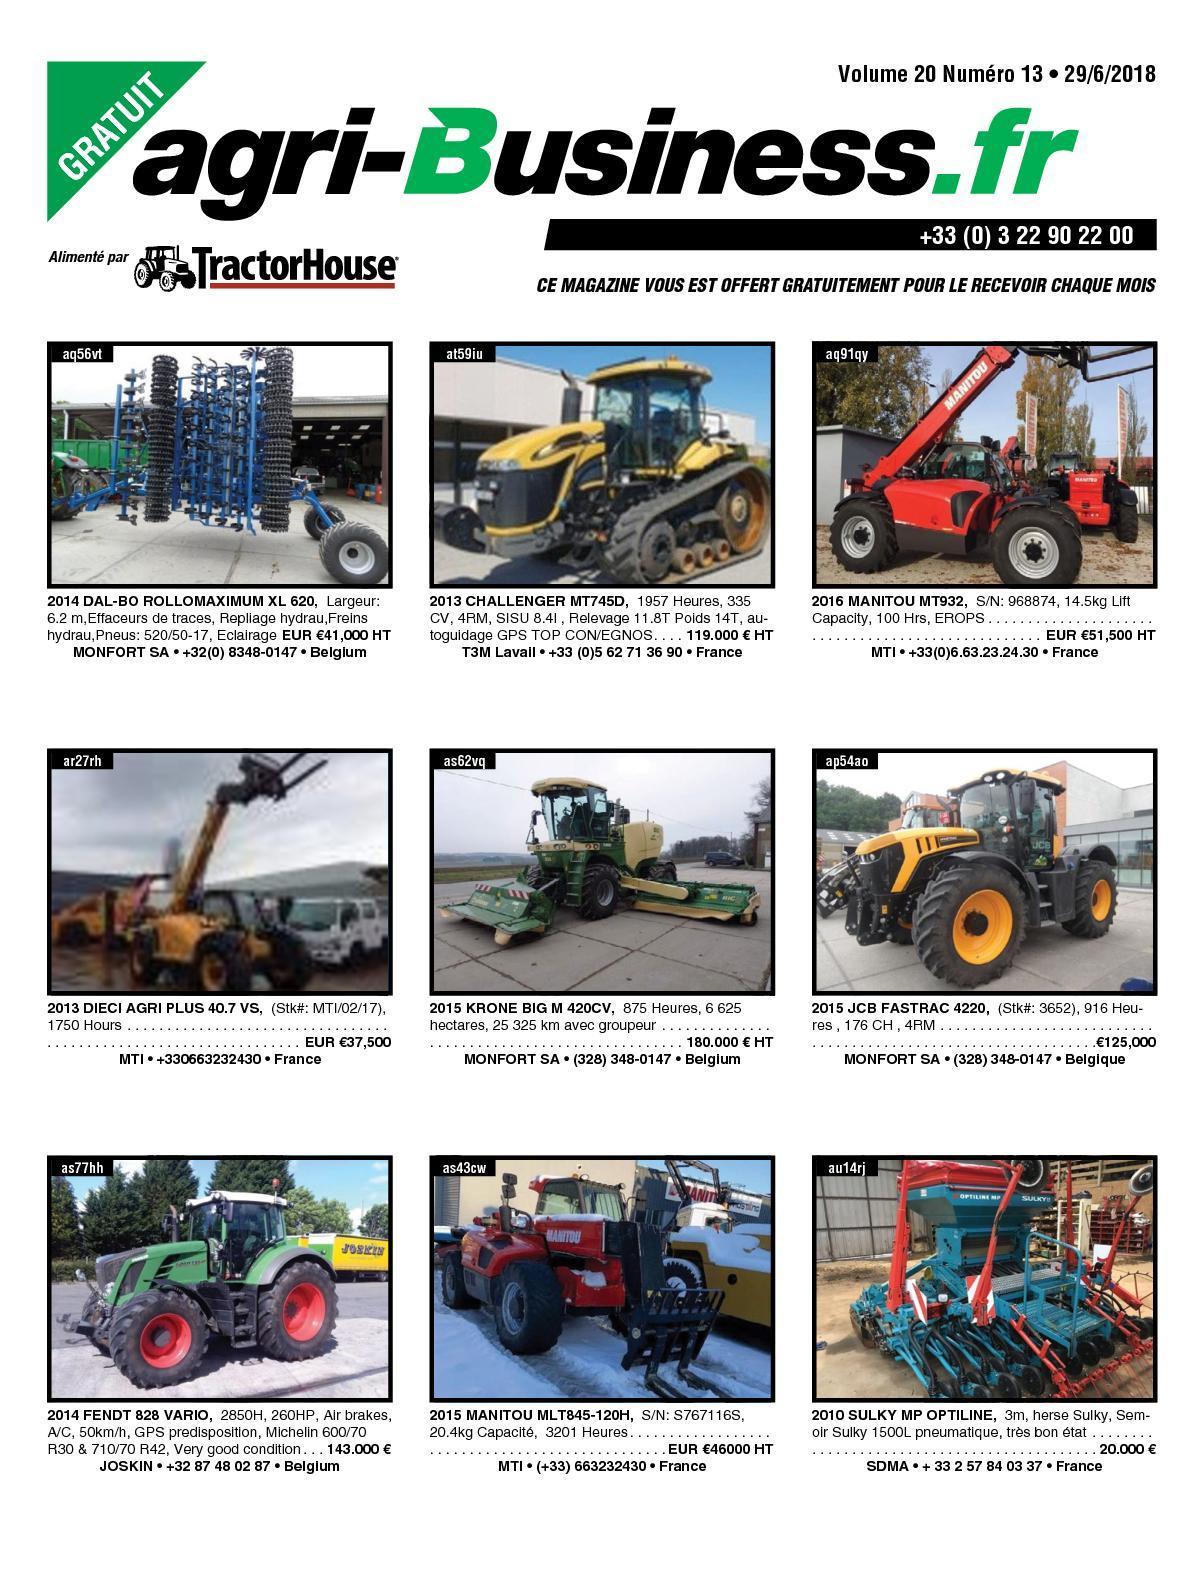 calaméo agri business volume 20 numÉro 13 29 06 2018